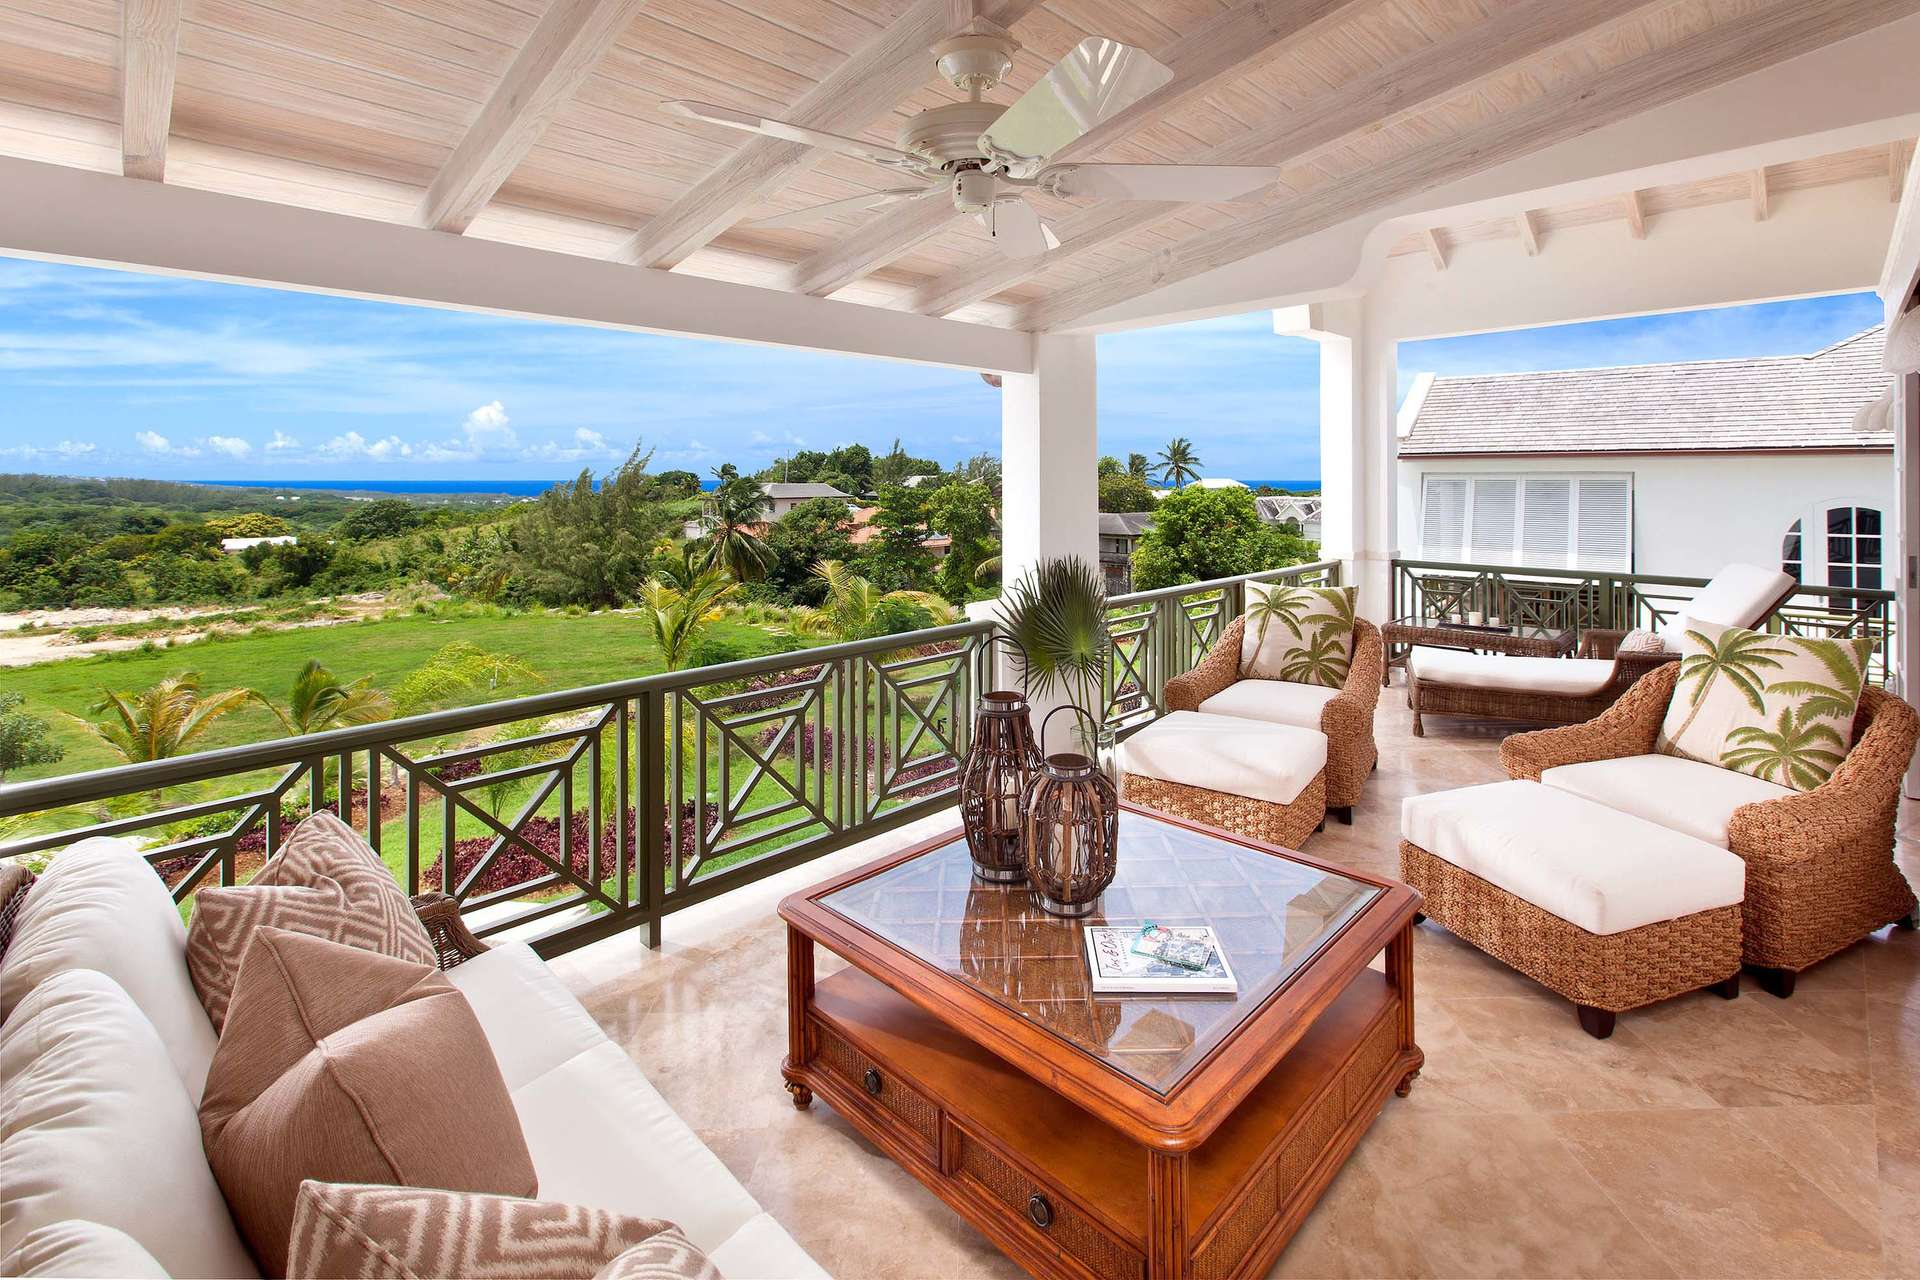 Luxury villa rentals caribbean - Barbados - St james - Royal westmoreland golf resort - Coral Blu - Image 1/12